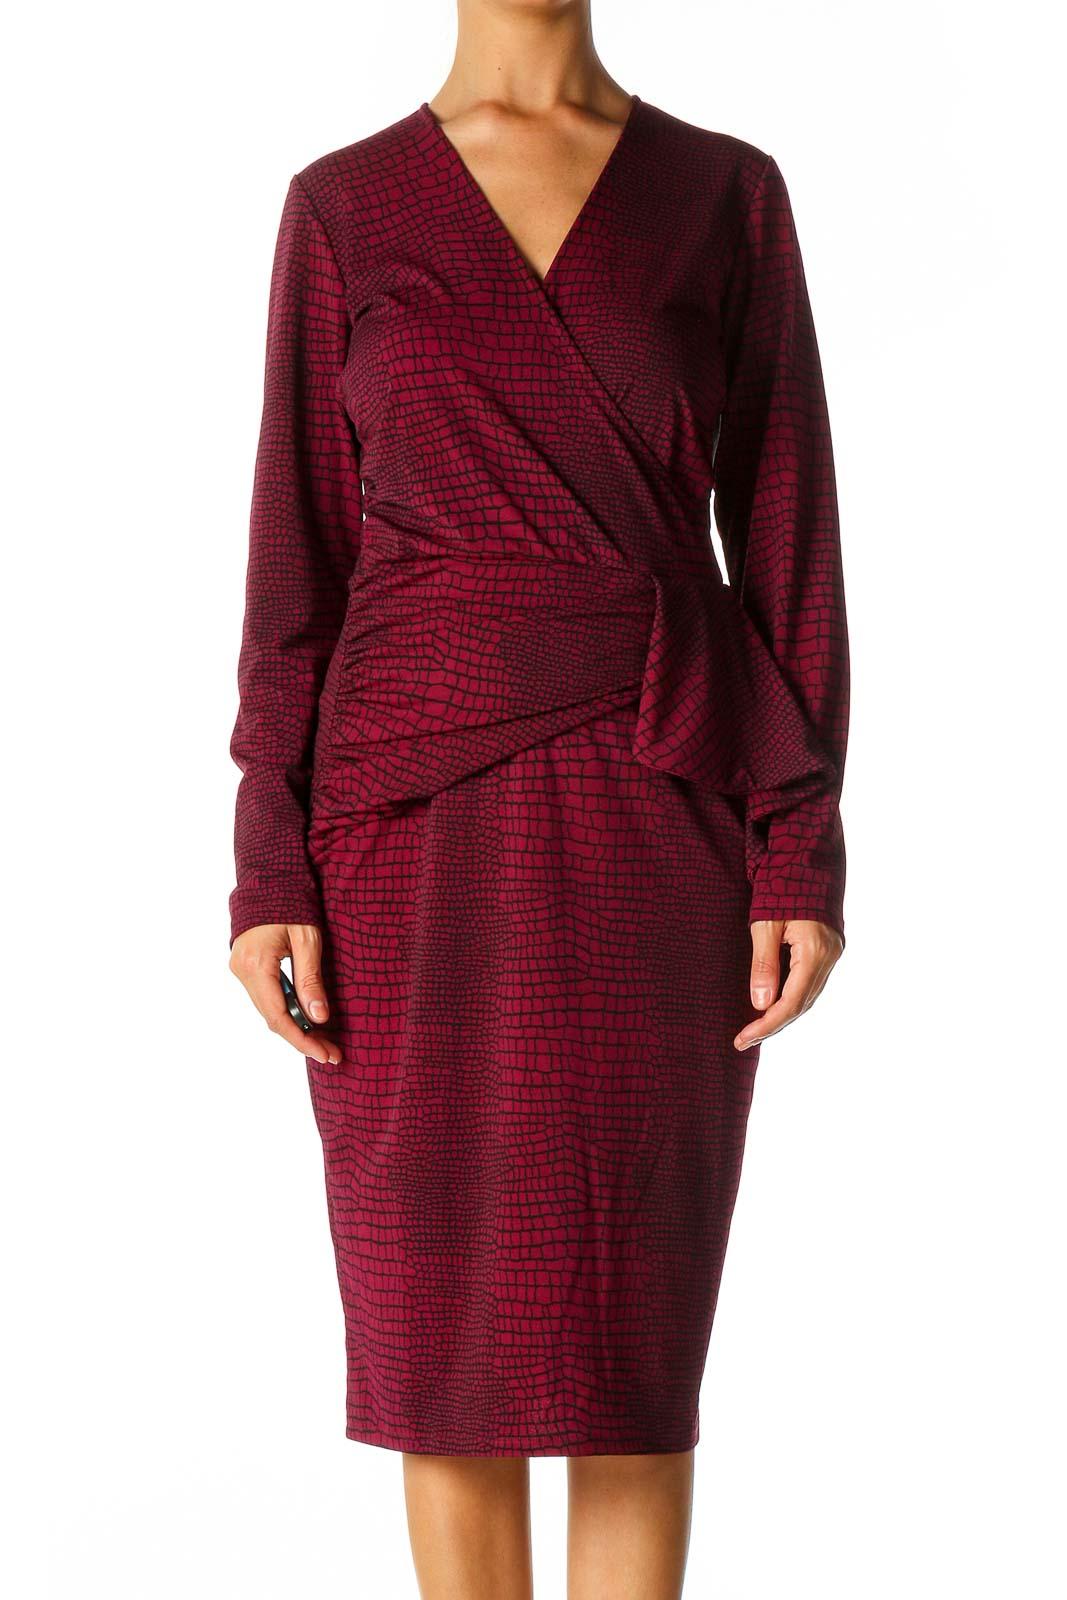 Red Animal Print Retro Sheath Dress Front